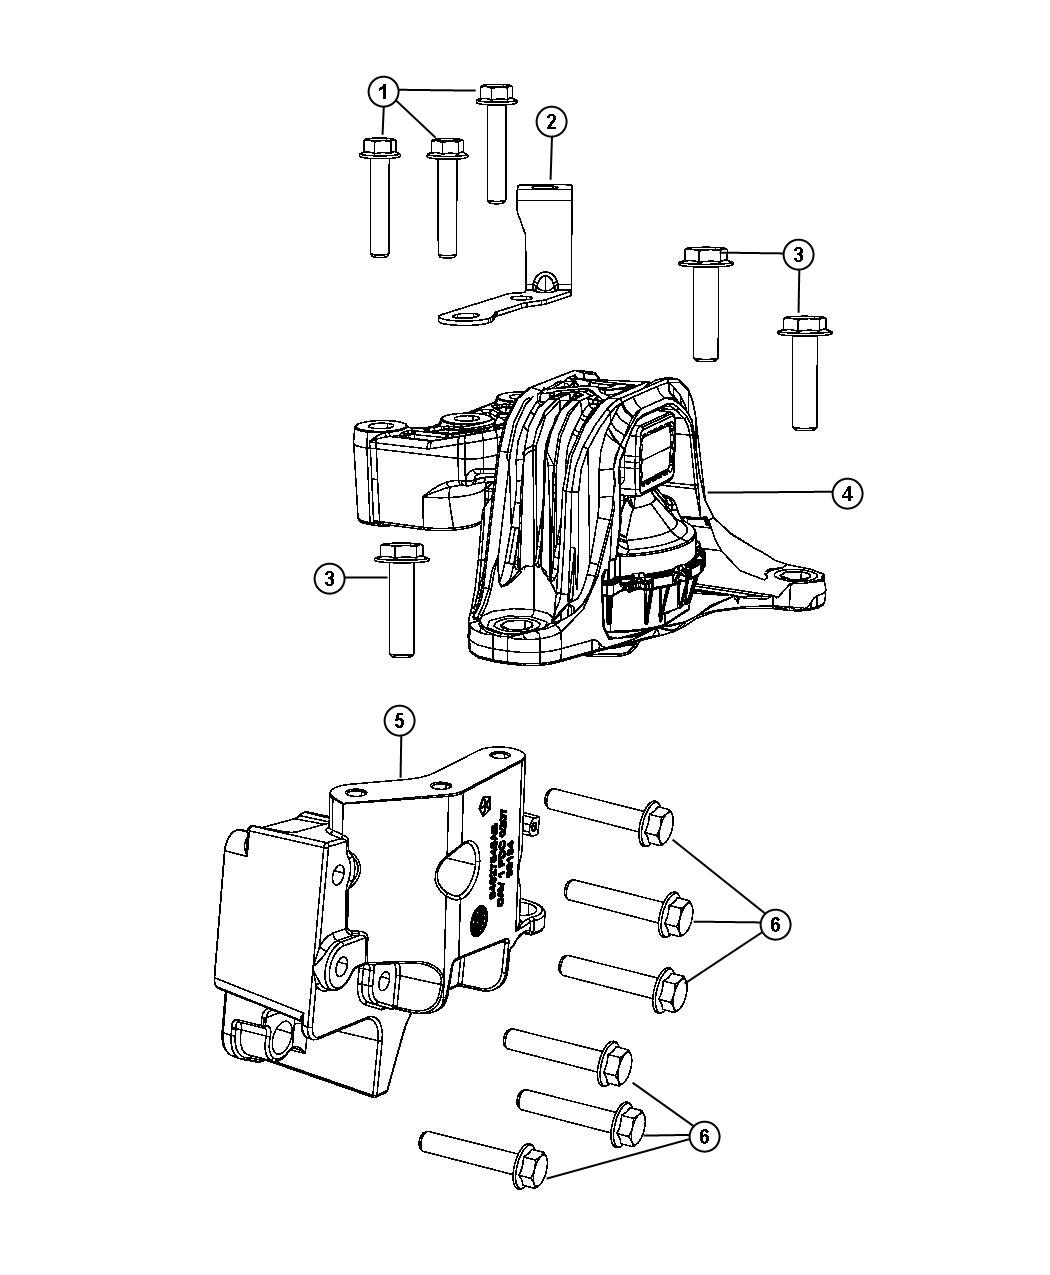 Fiat 500 Engine mount. Right. [6-spd aisin f21-250 auto